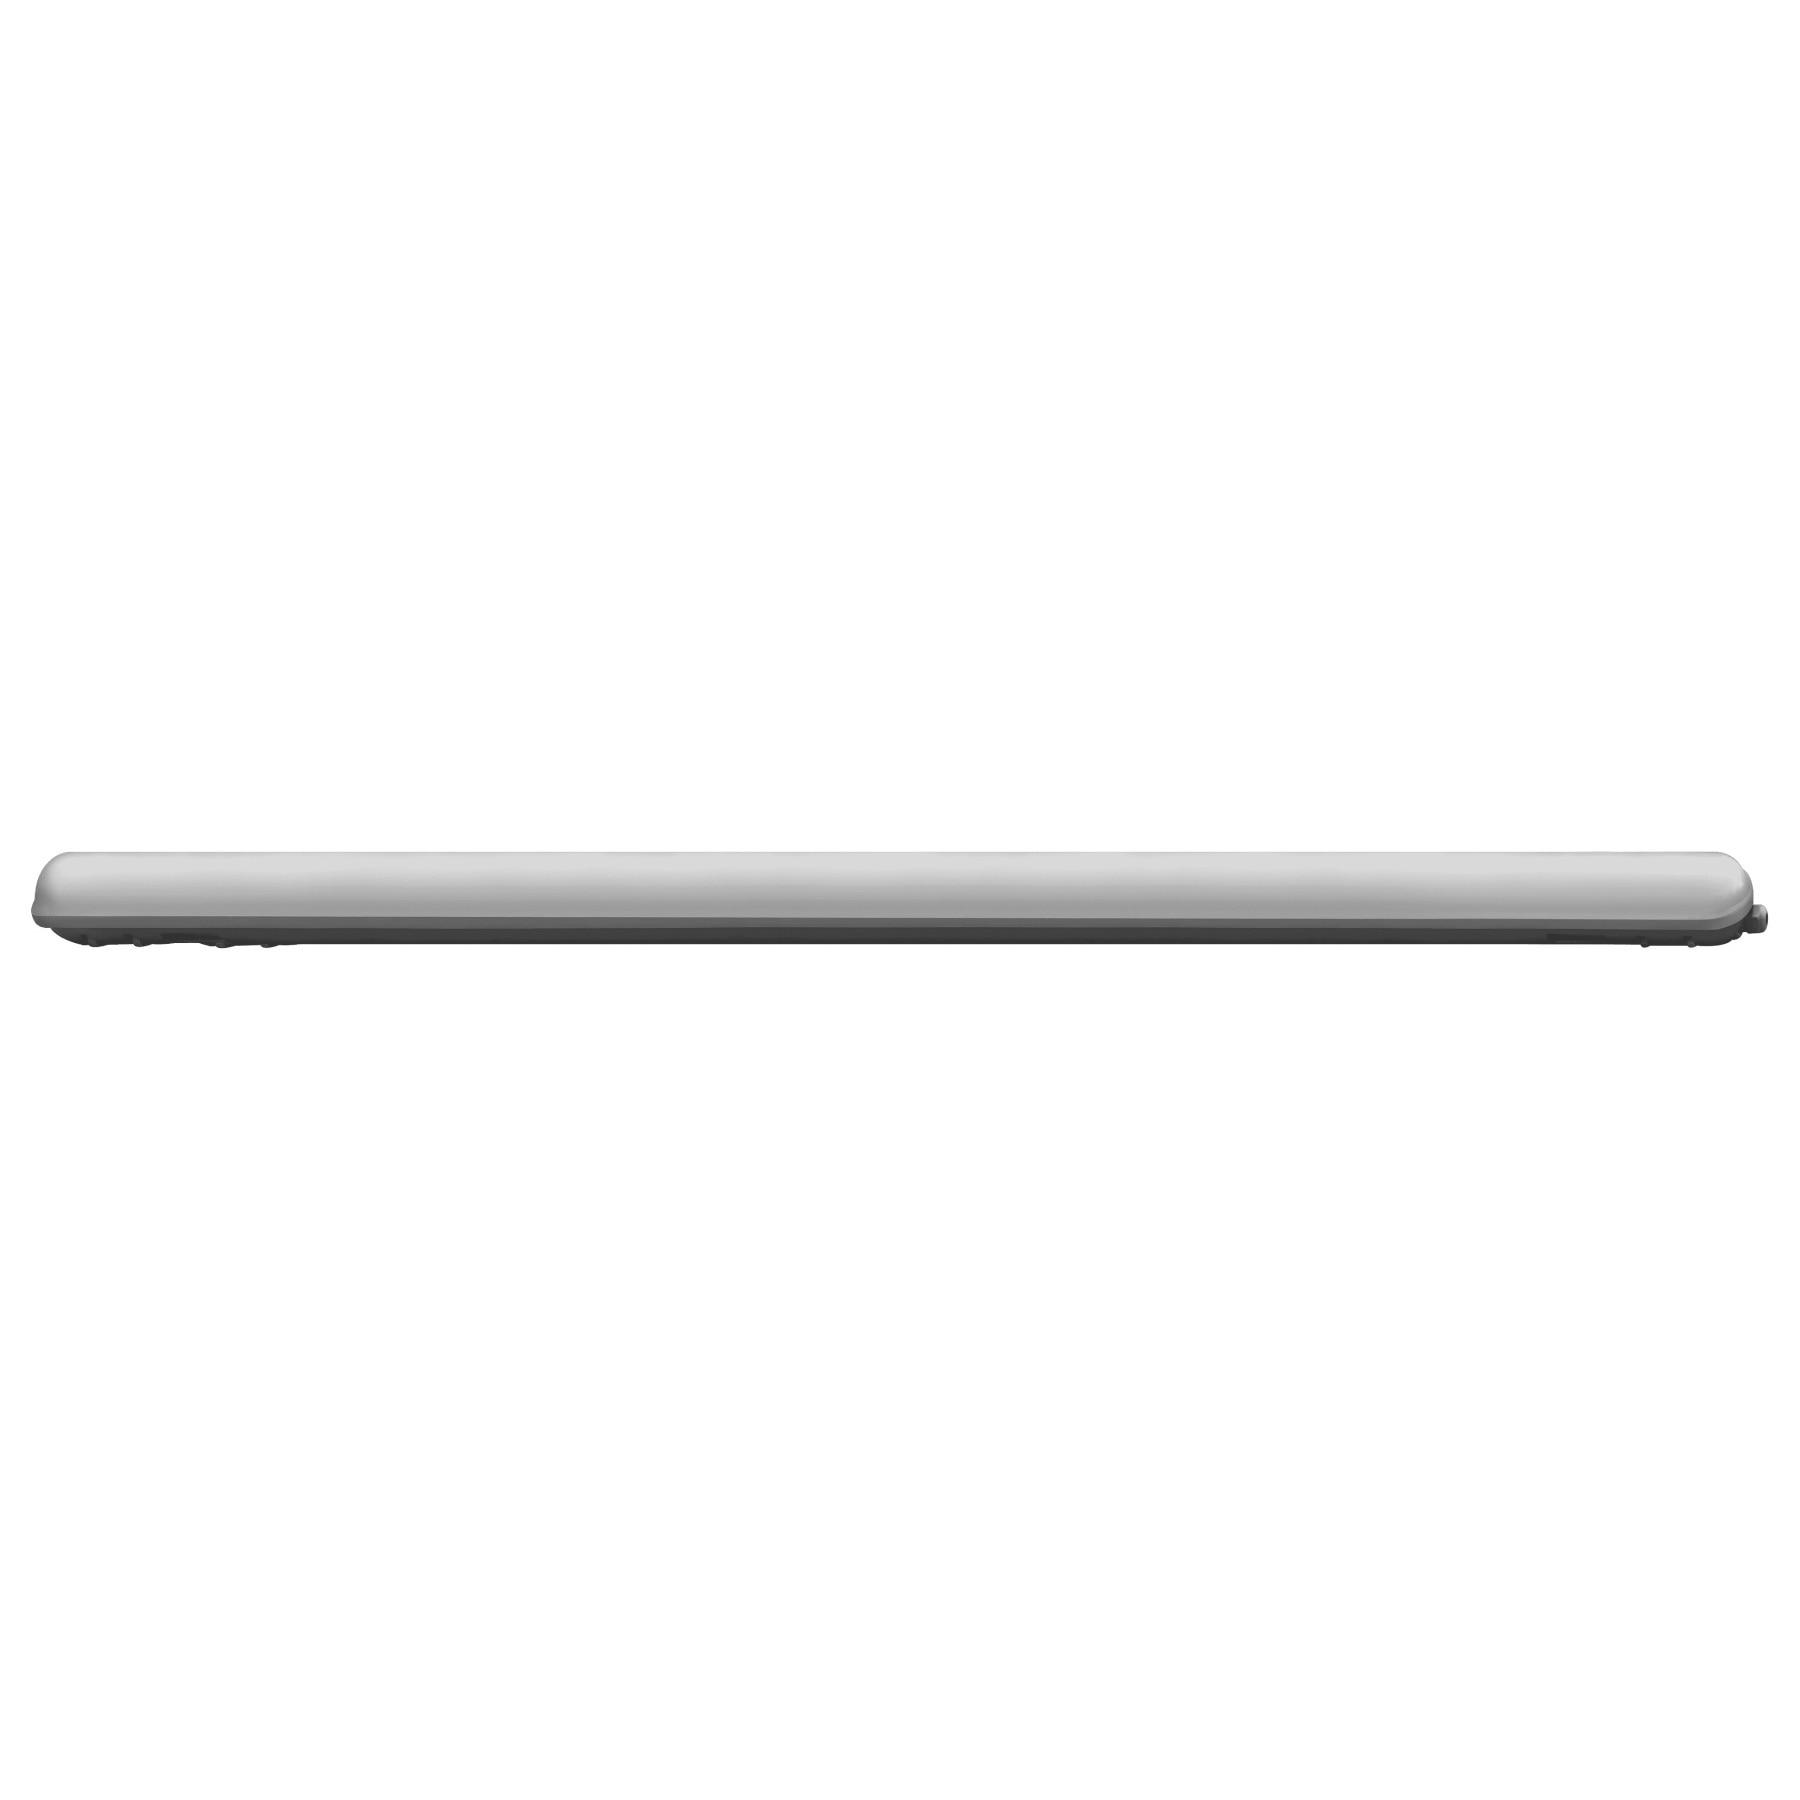 Lamp Led Spp-159 36w 4000 K IP65 (analog Of LED Panel 2x36) LLT 4690612004914